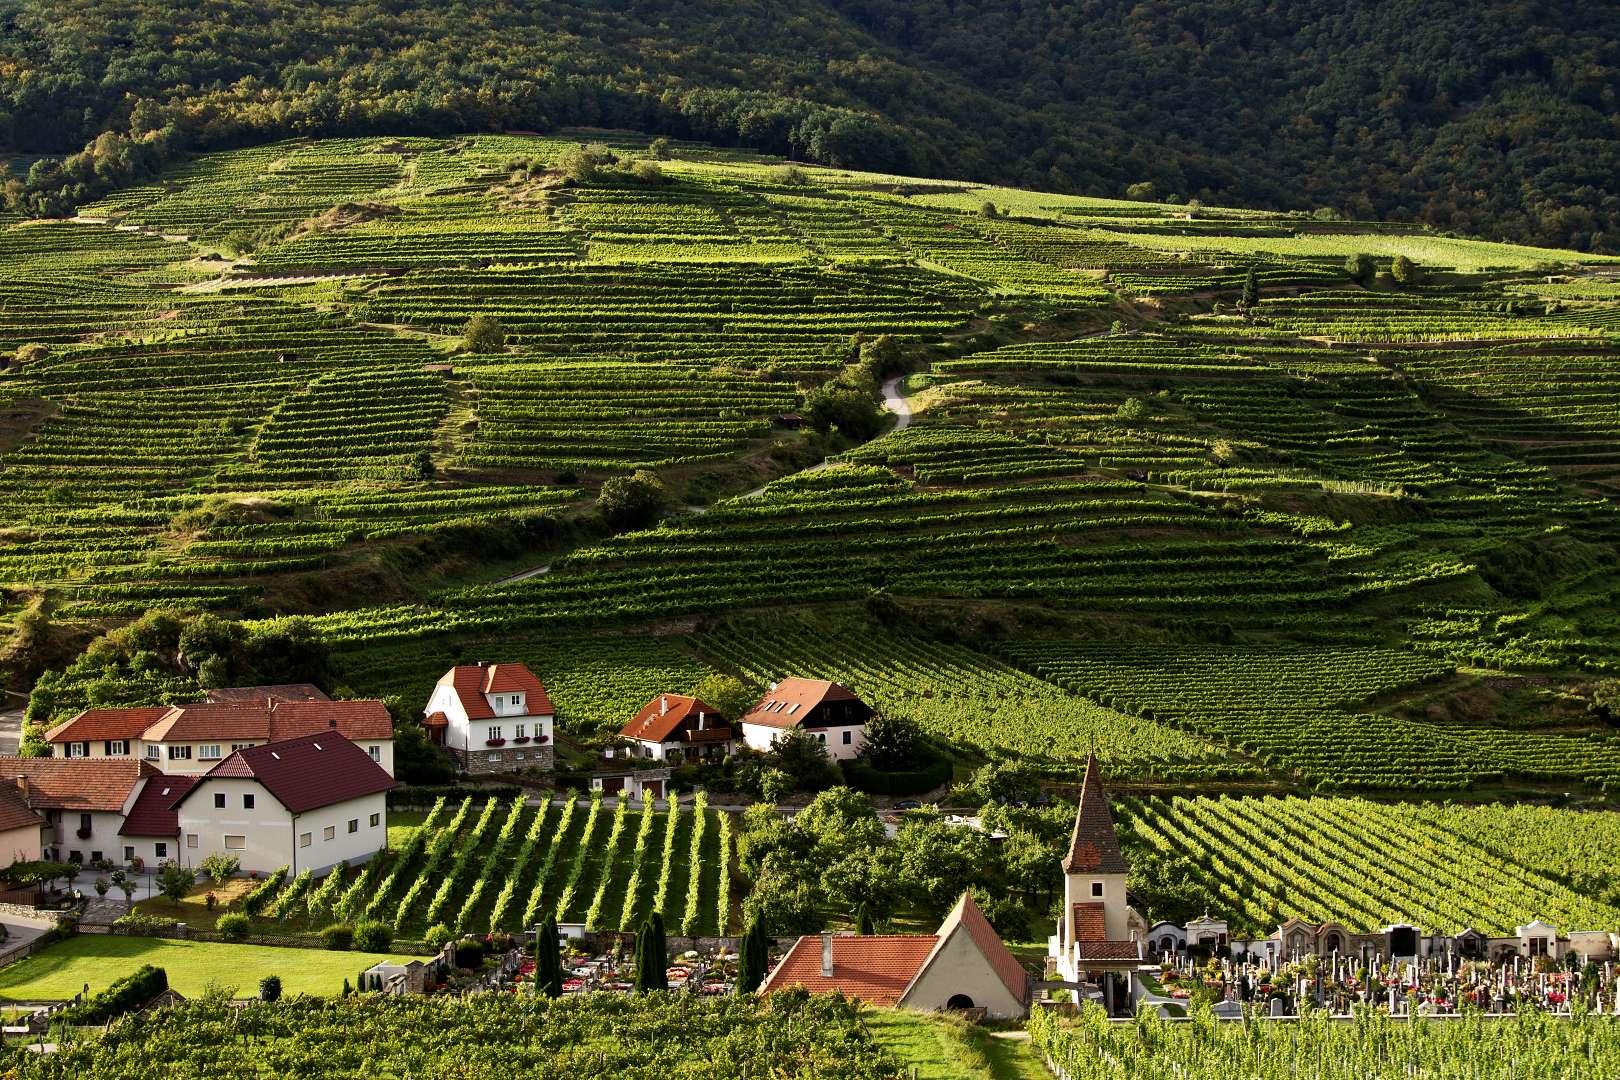 Wachau: Vinice Gasslreith